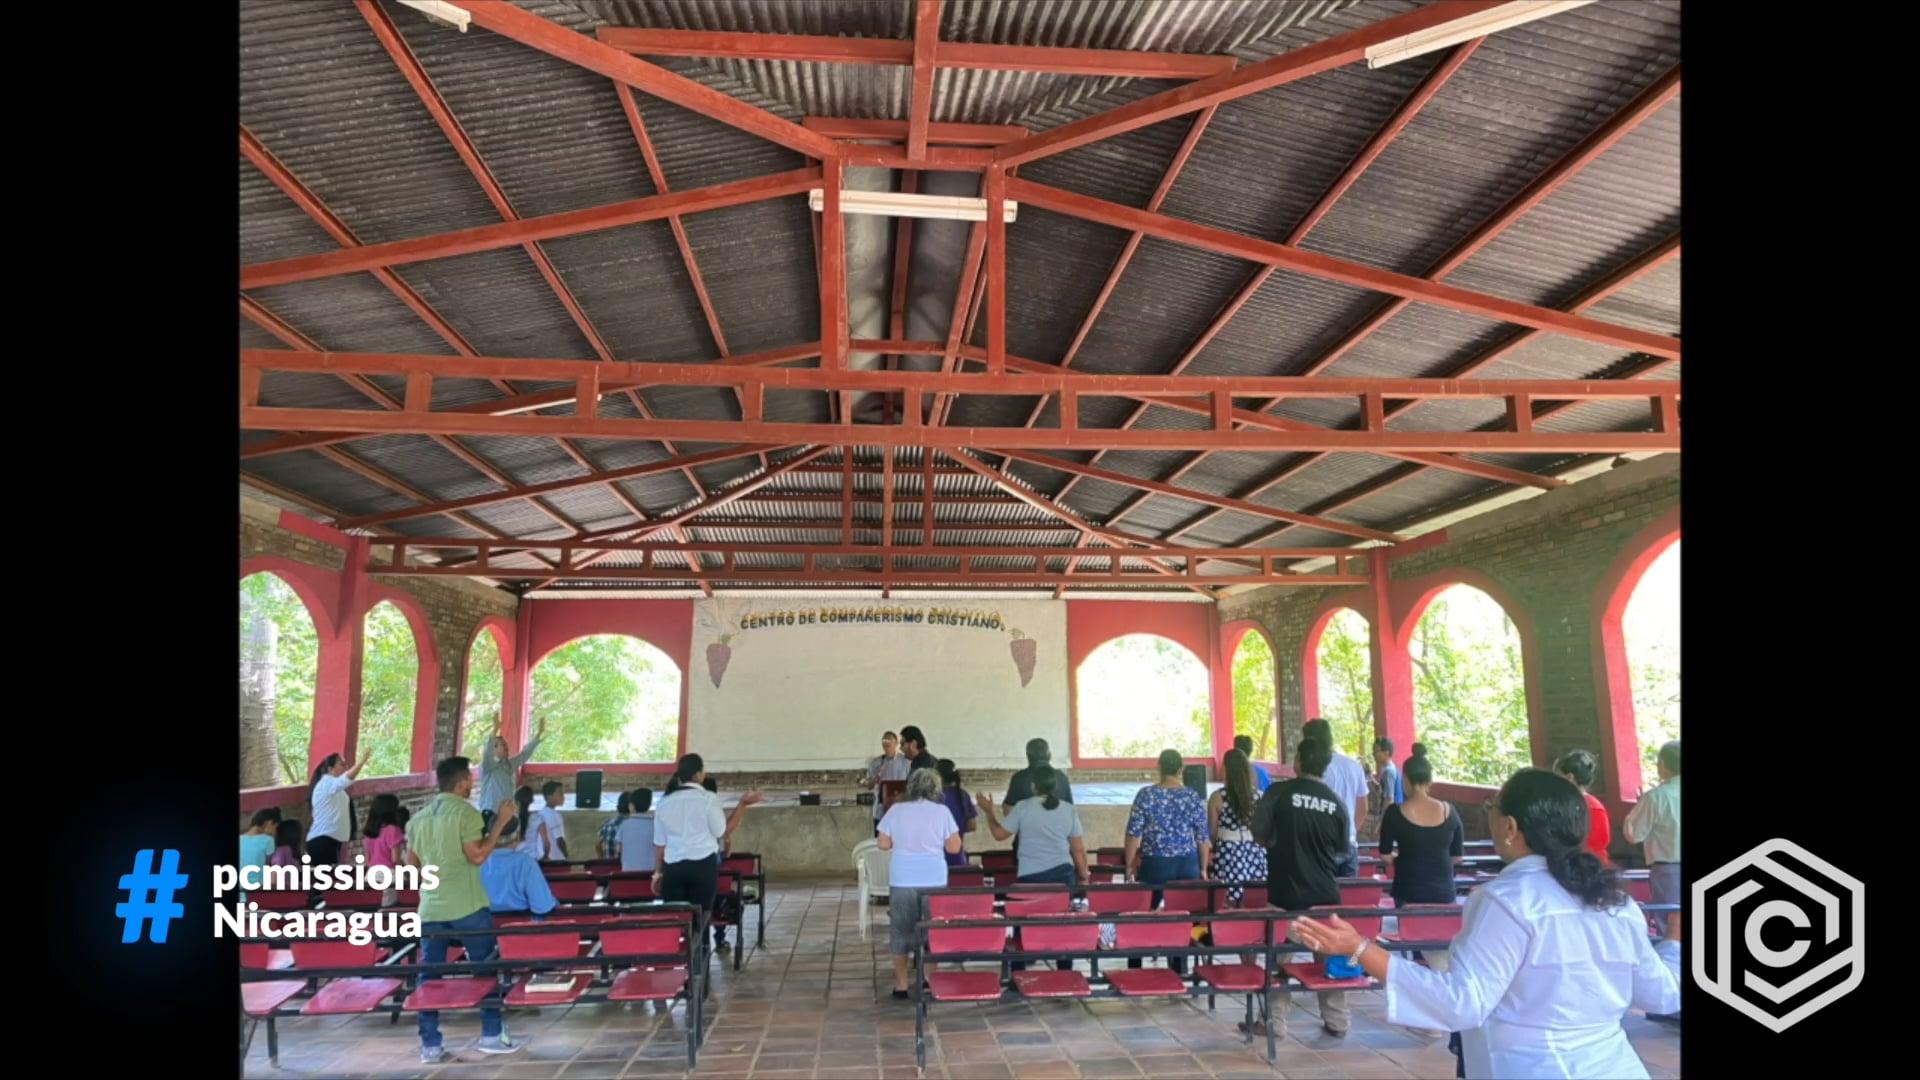 Nicaragua 2021 update